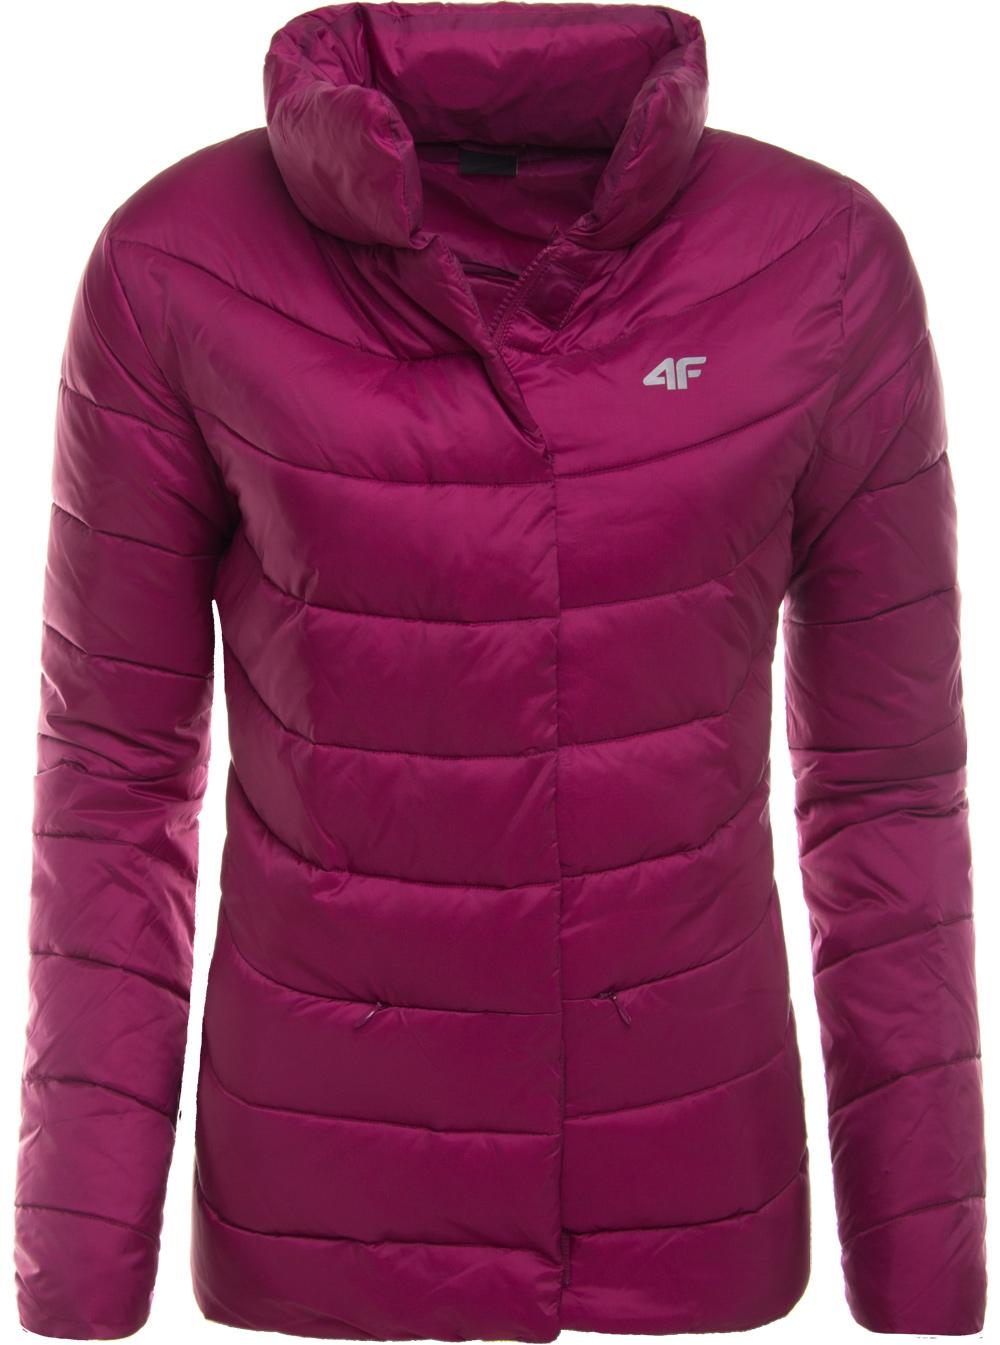 Zimná bunda dámska 4F KUD009